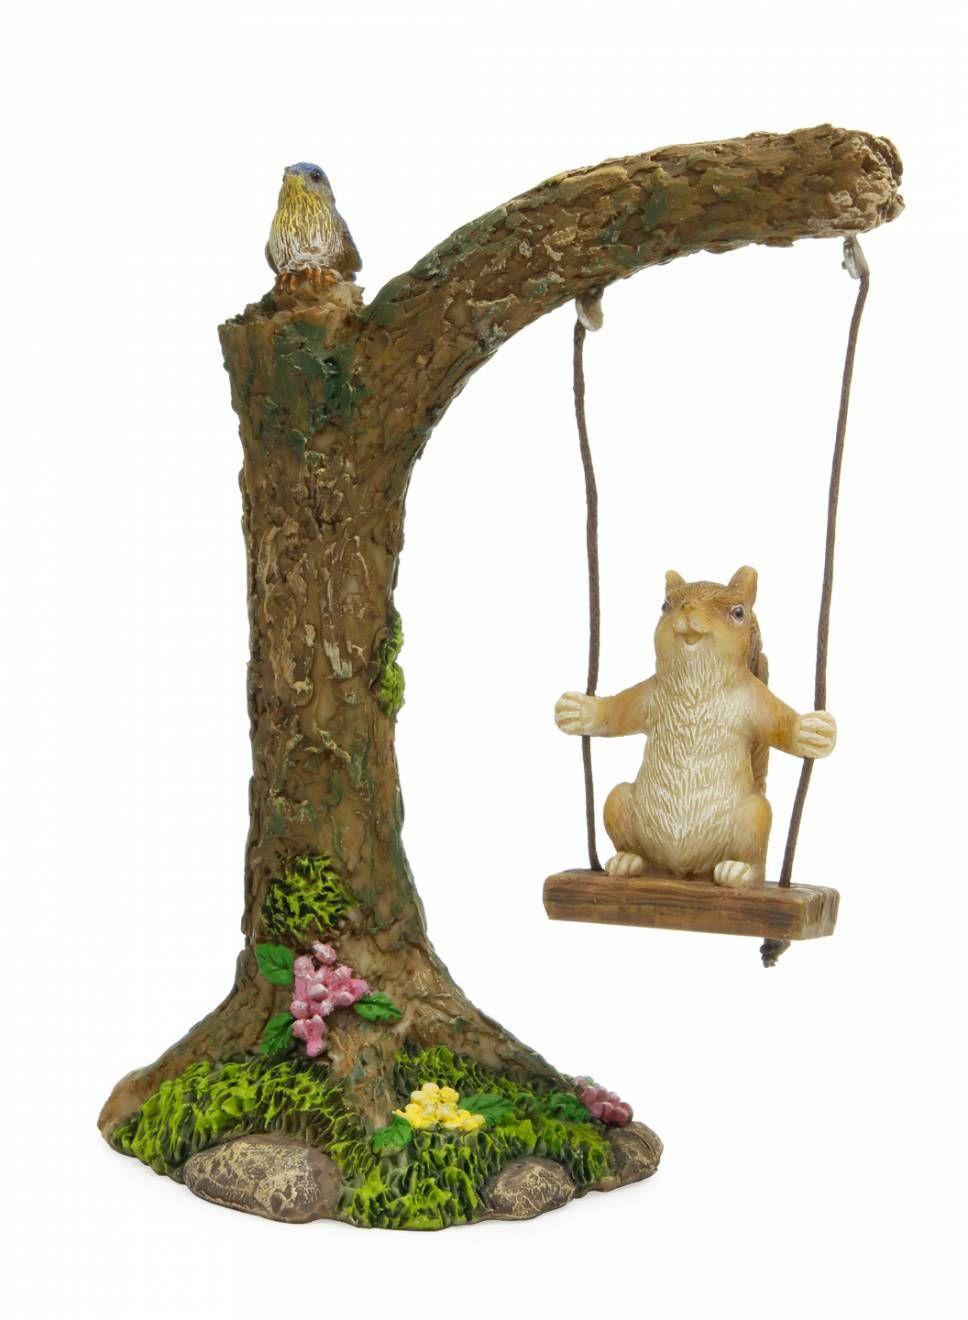 Fairy Garden Tree, Miniature Tree, Mini Tree With Swing, Accessory For Miniature  Garden, Mini Accessory, Fairy Garden Tree Swing